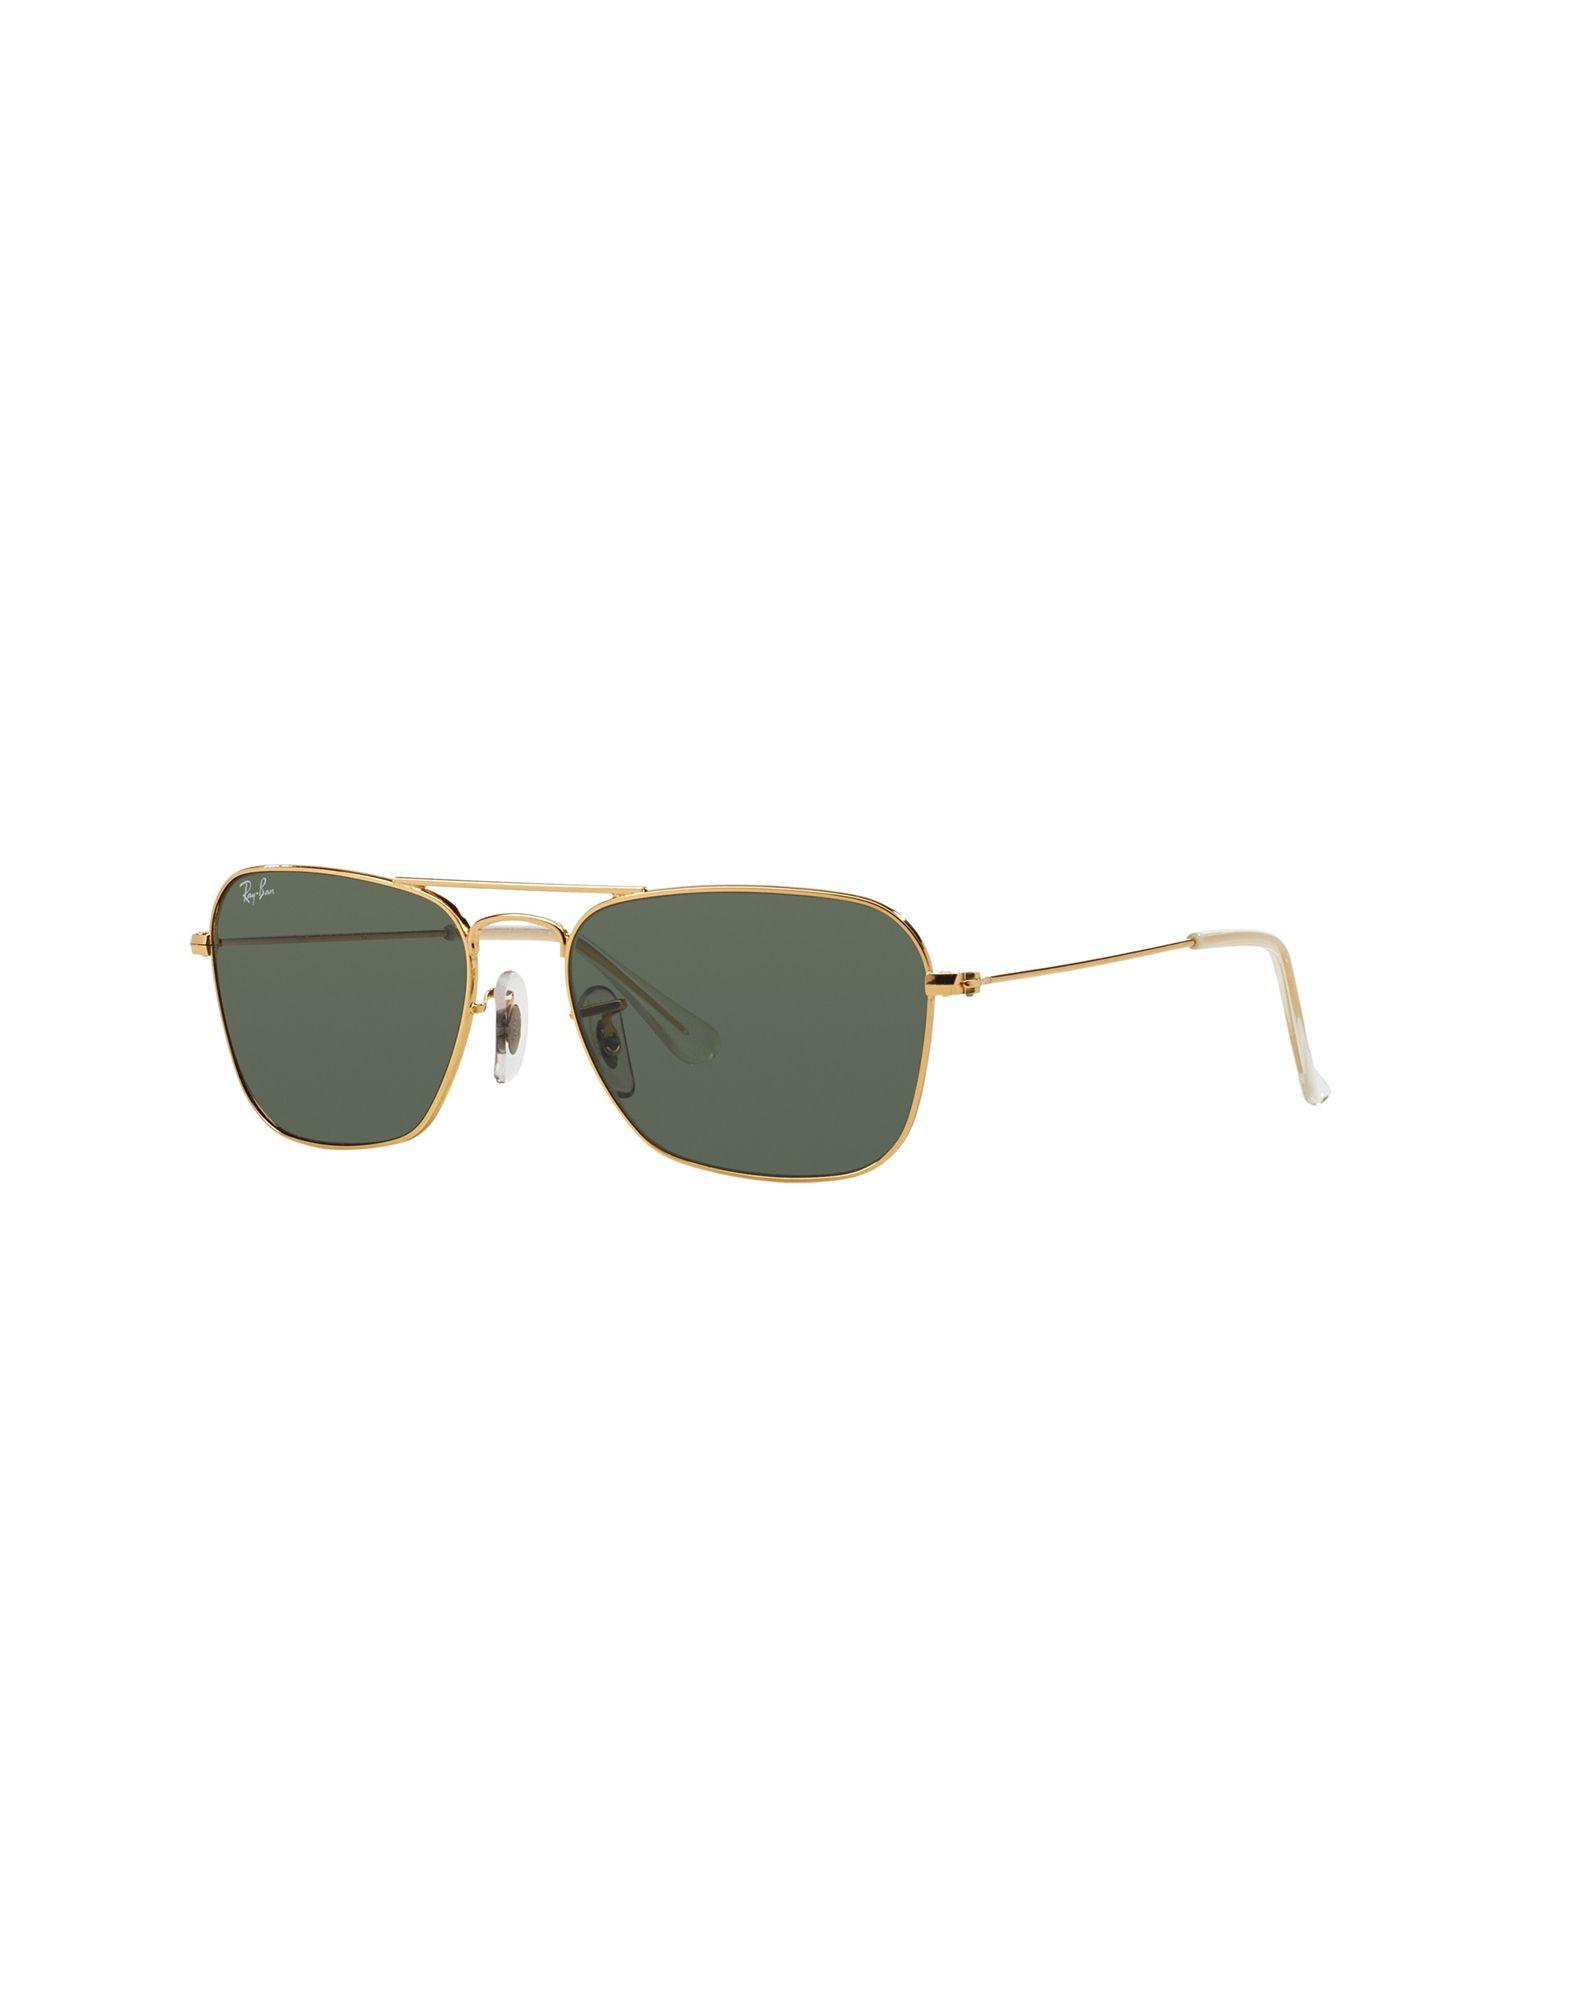 RAY-BAN Солнечные очки очки ray ban 0rb3016 w0366 51